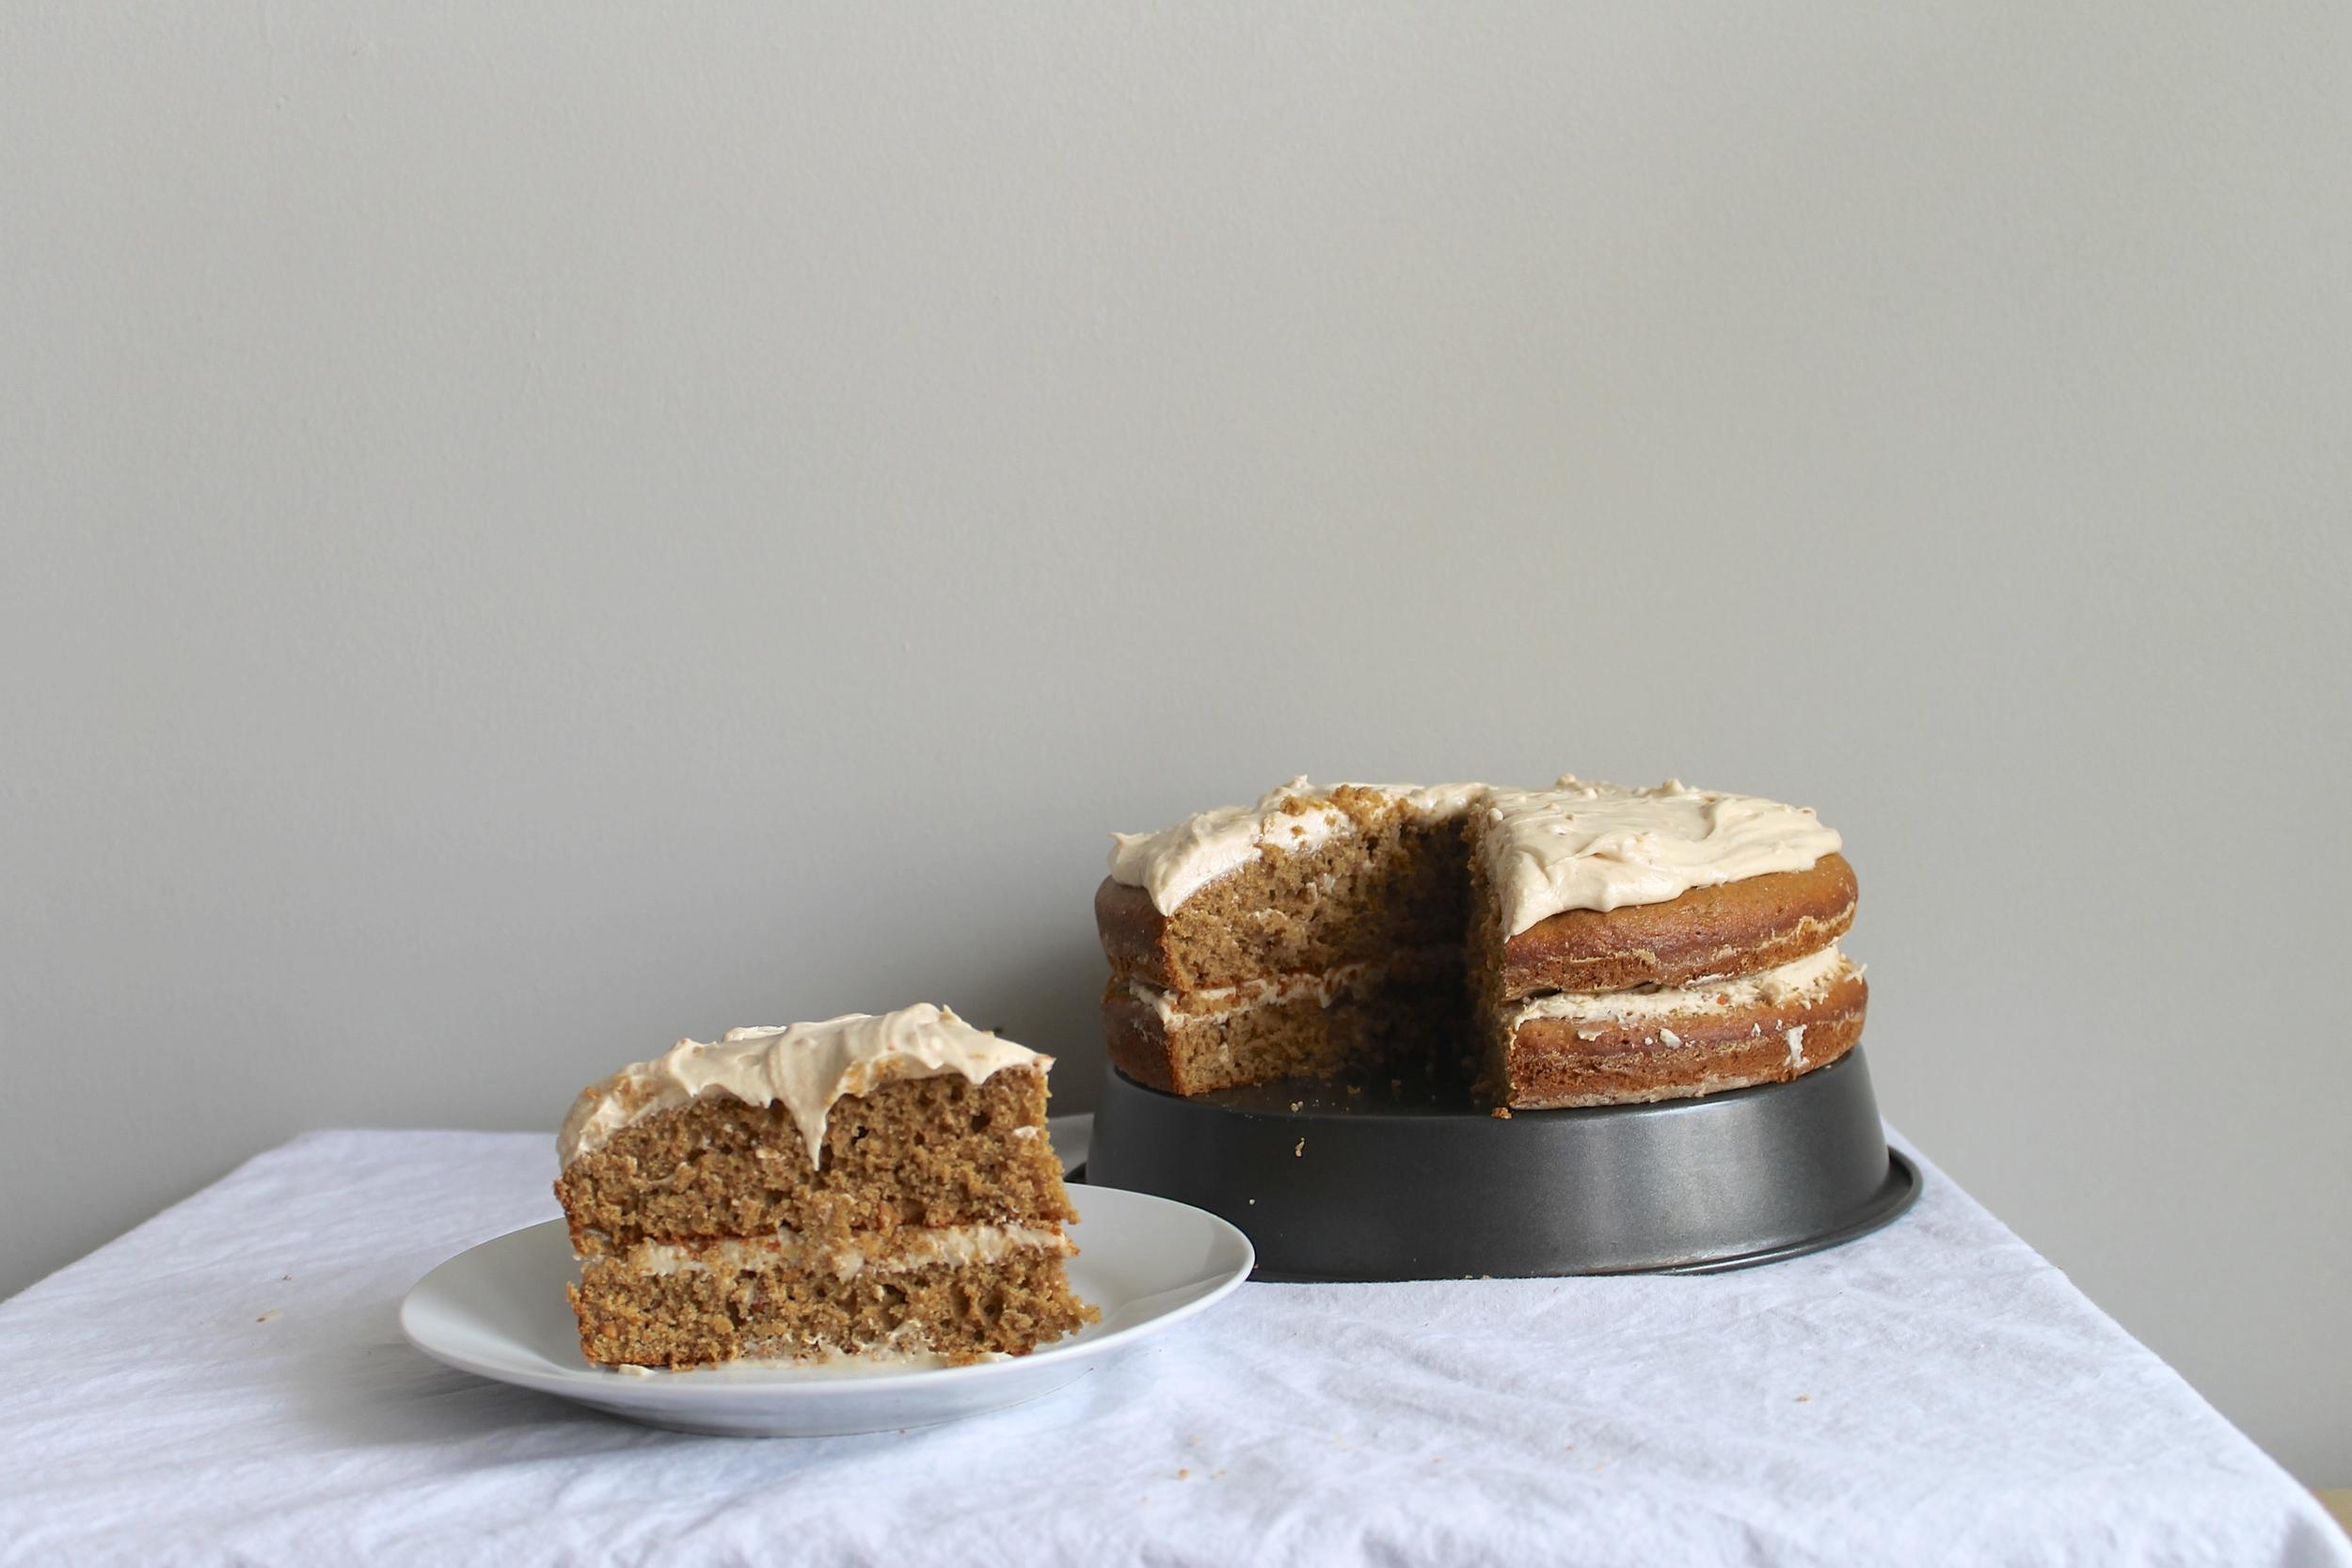 Peanut-butter-birthday-cake-7.jpg